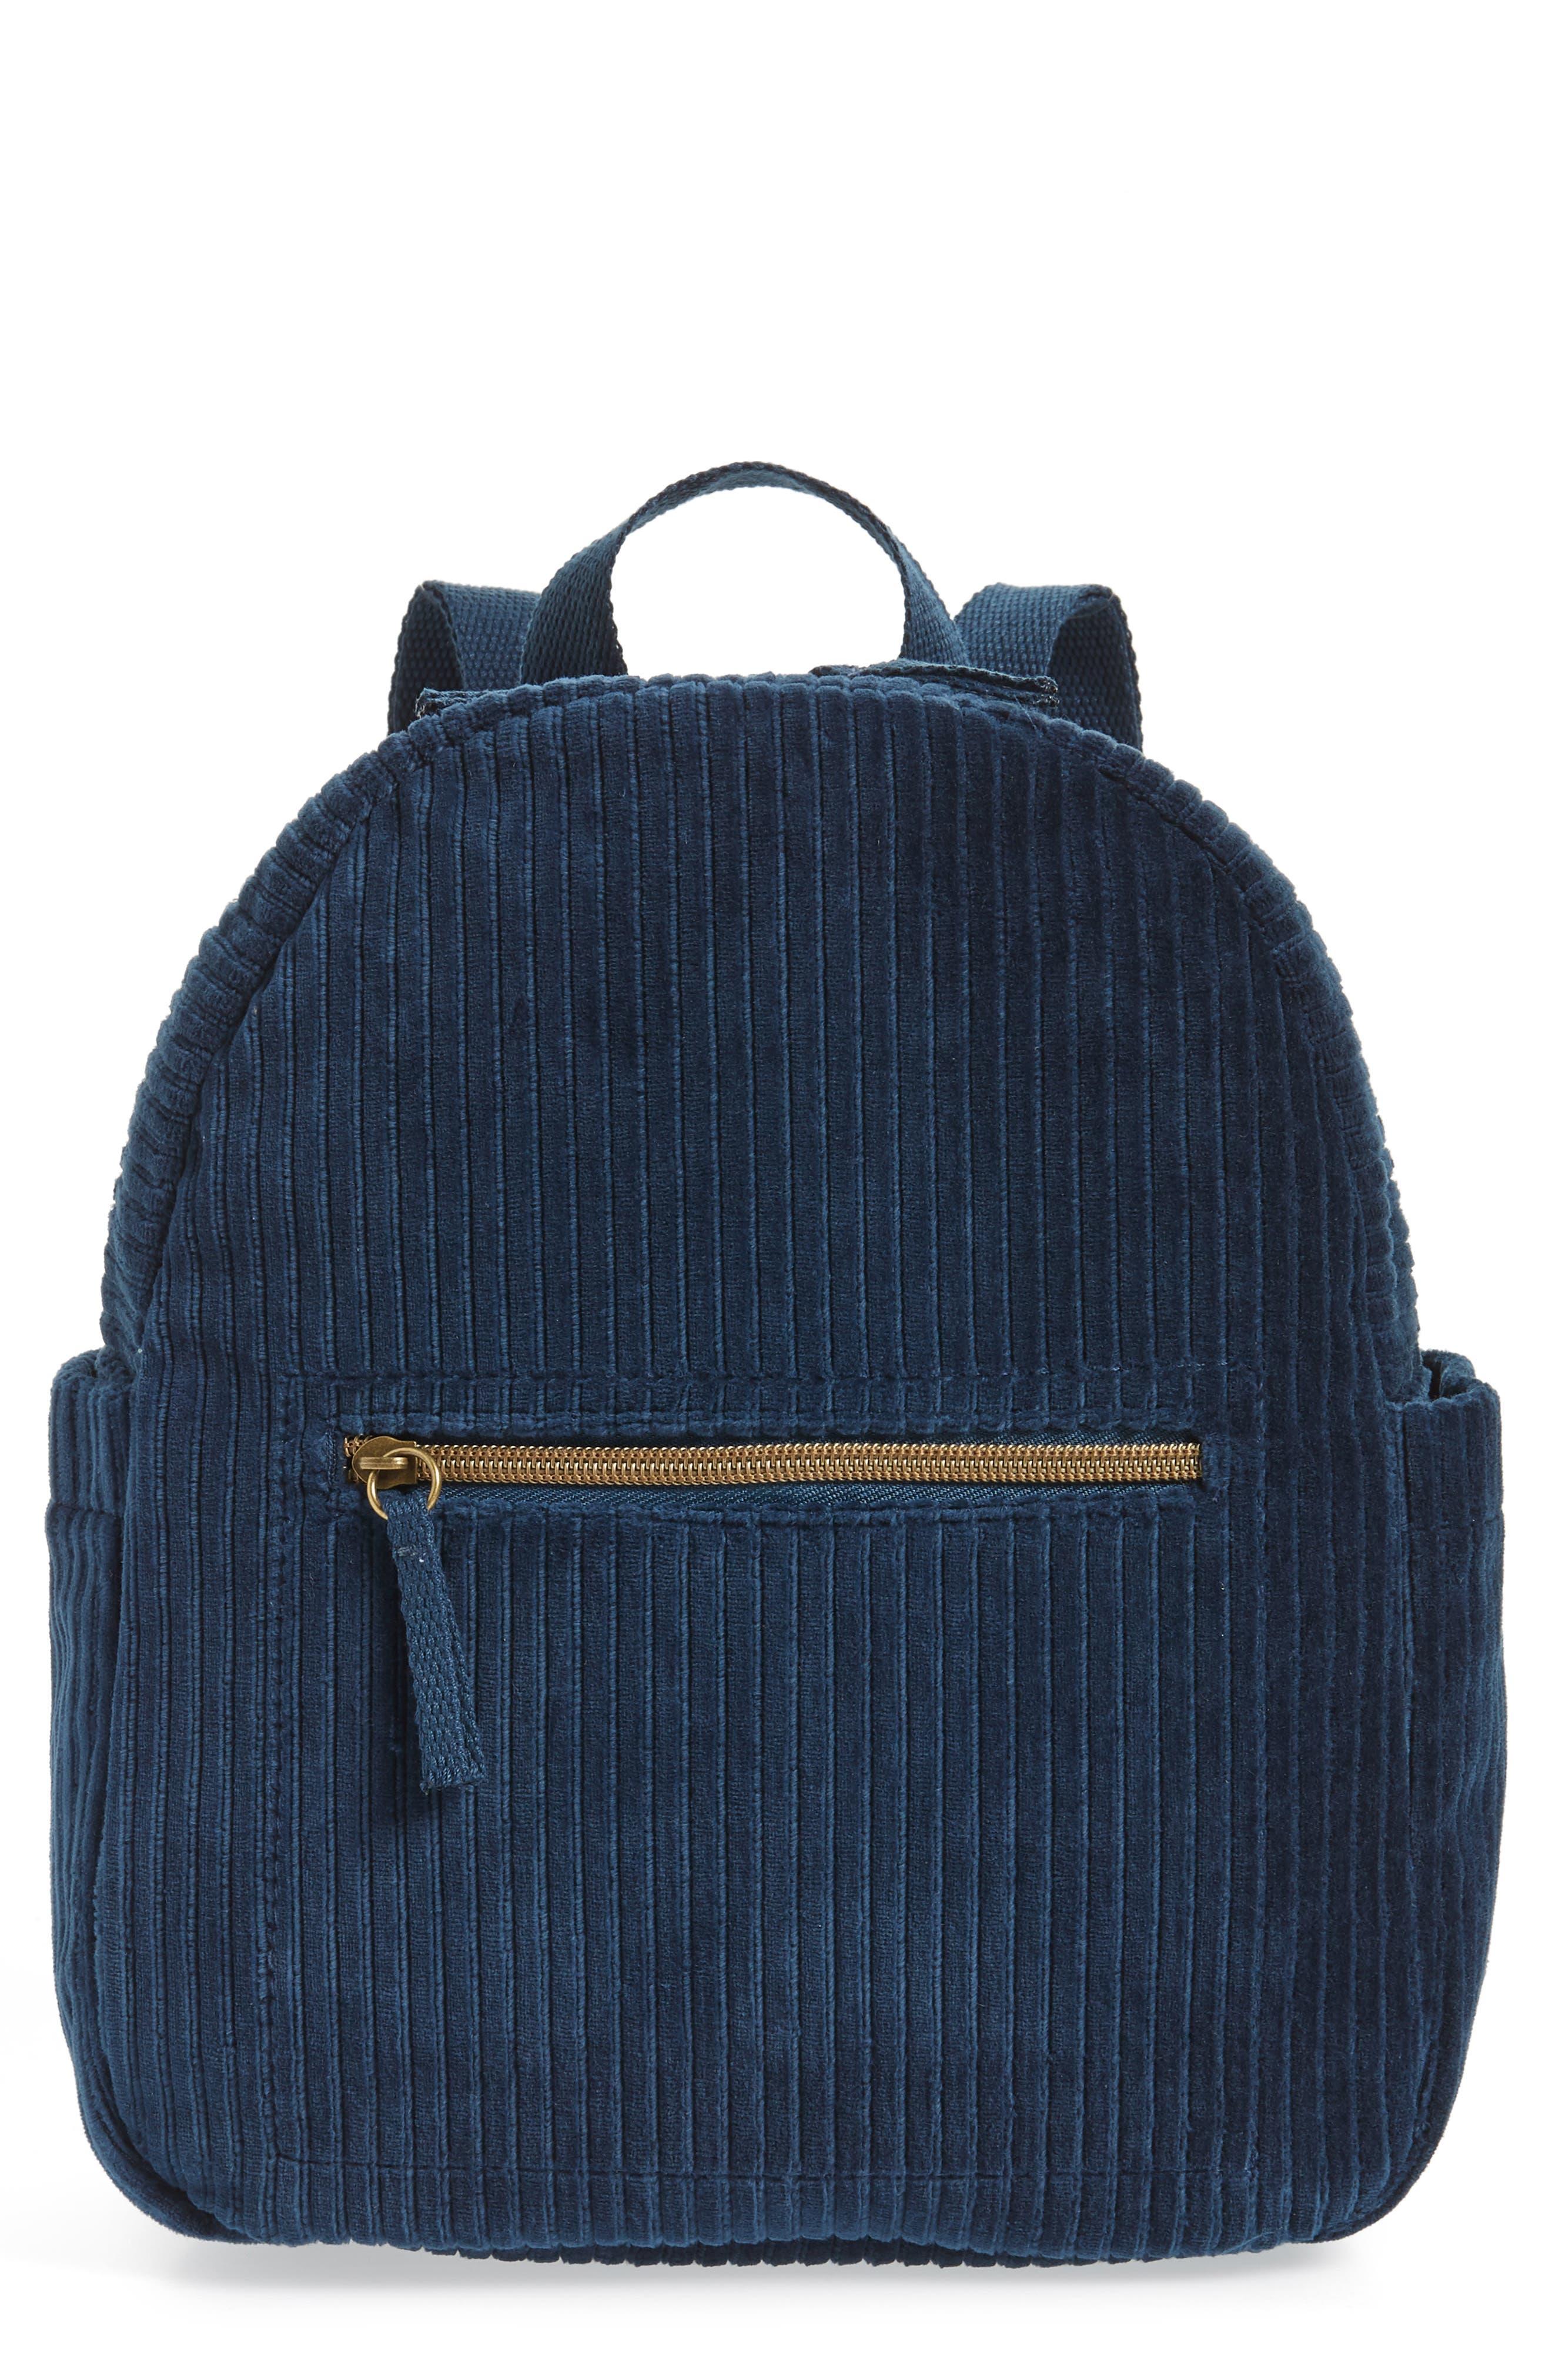 Corduroy Mini Backpack,                         Main,                         color, 440